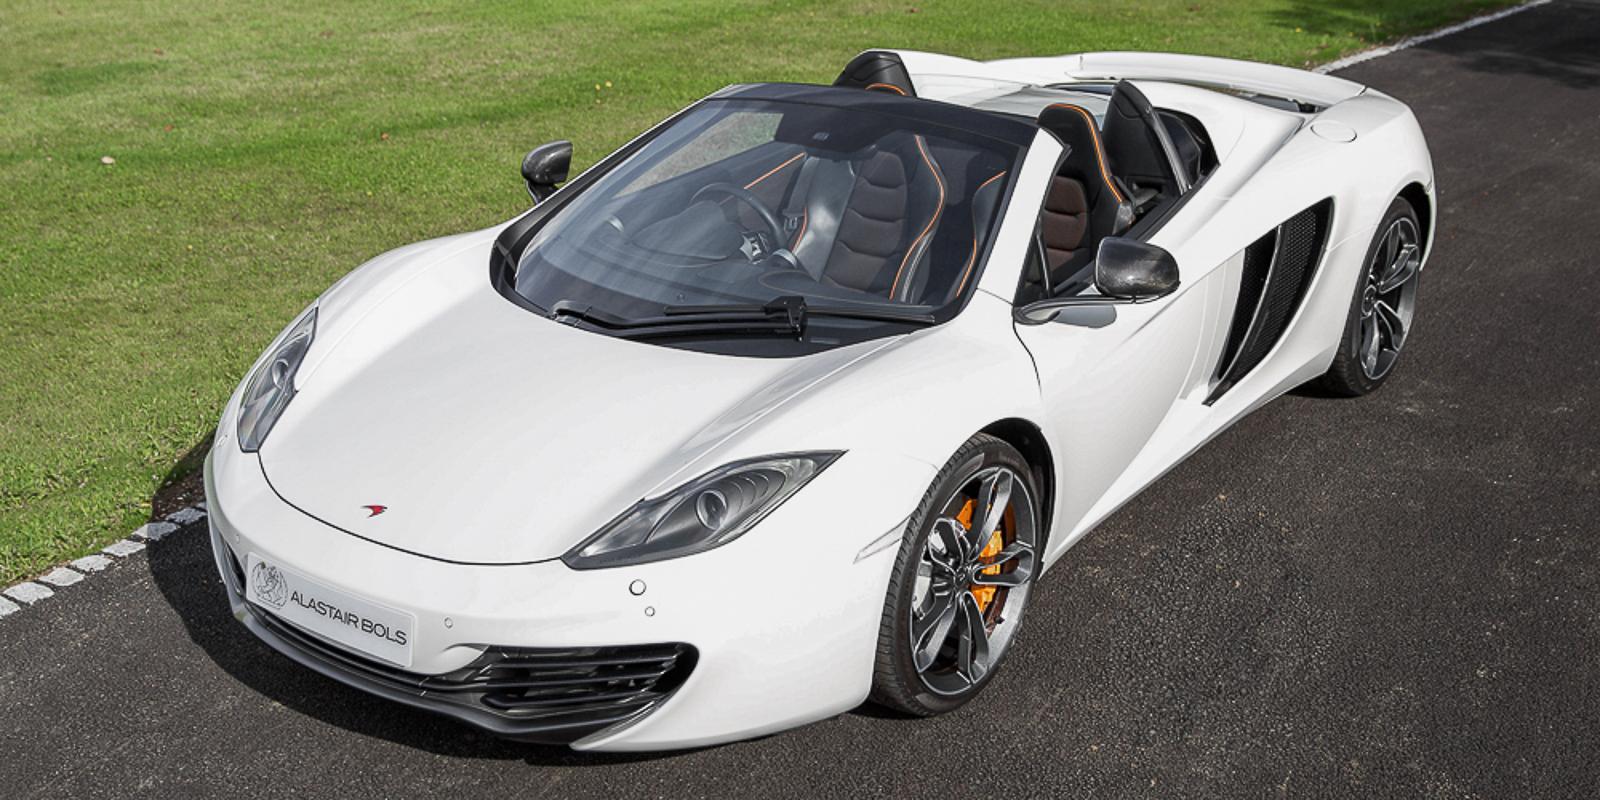 McLaren 12C Spider – Pearl White